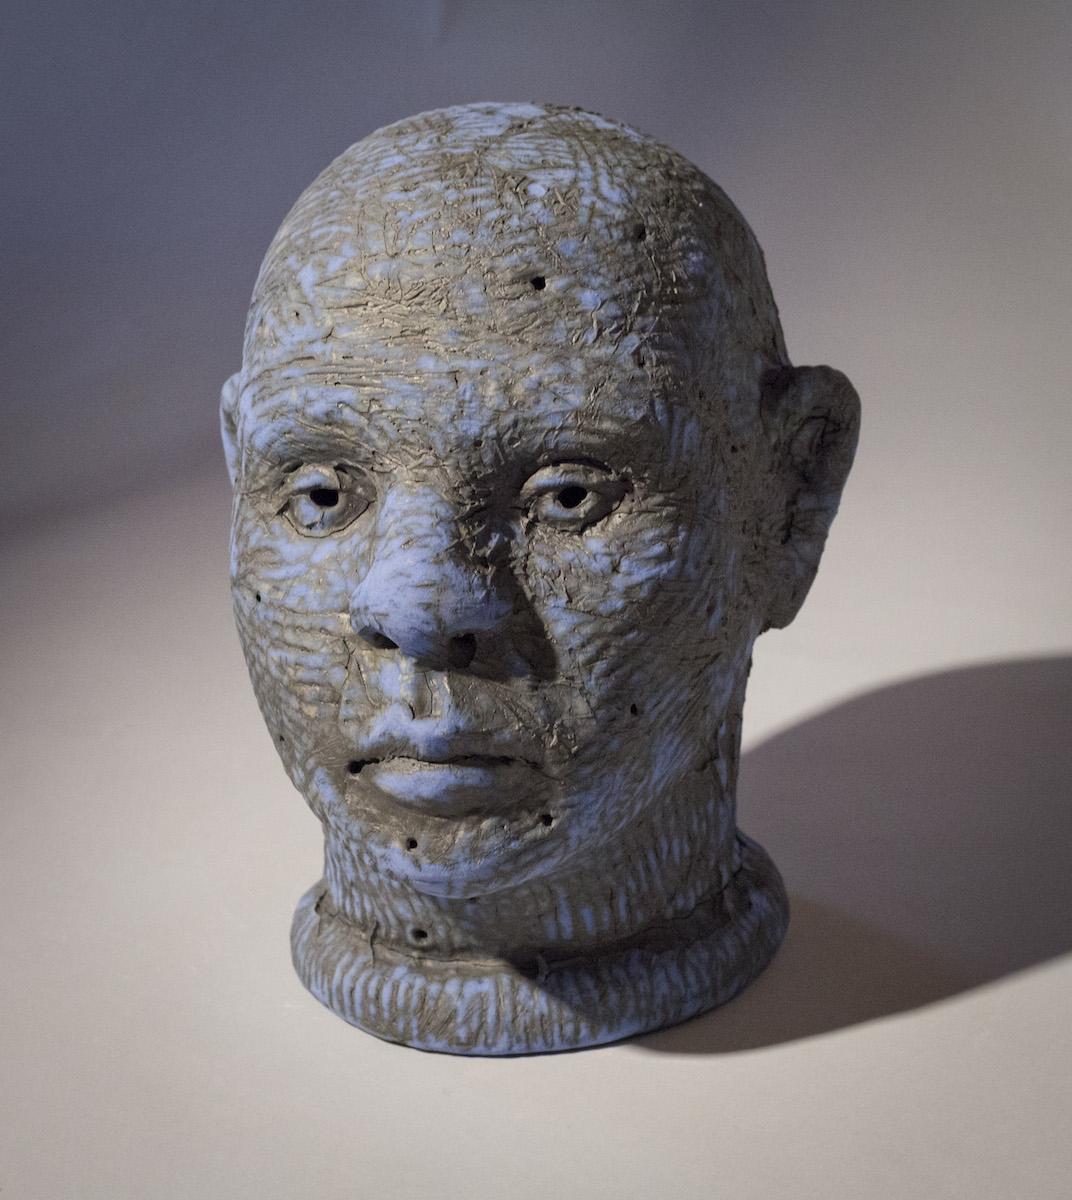 Tom Bartel, Blue Head, ceramic sculpture, Sherrie Gallerie